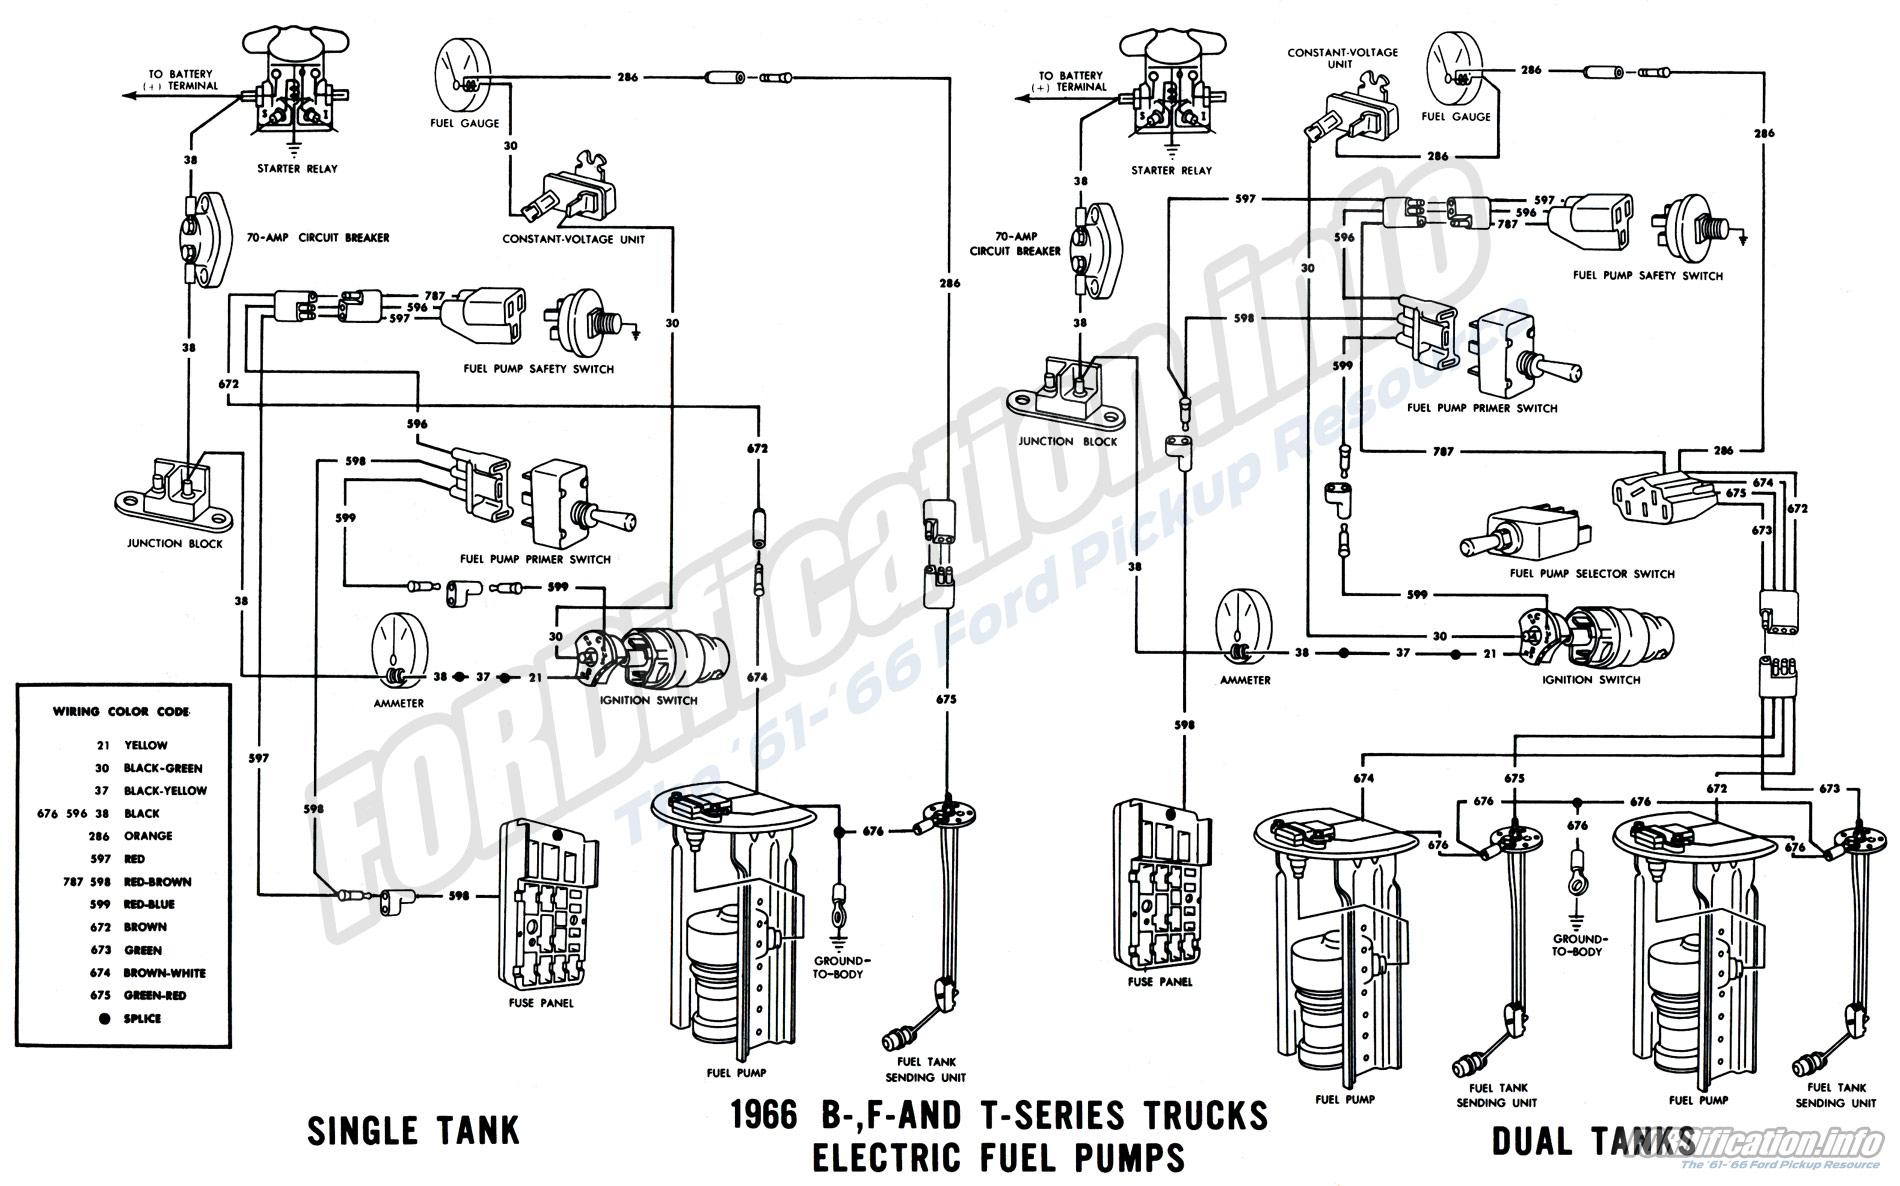 1959 f100 engine wiring diagram